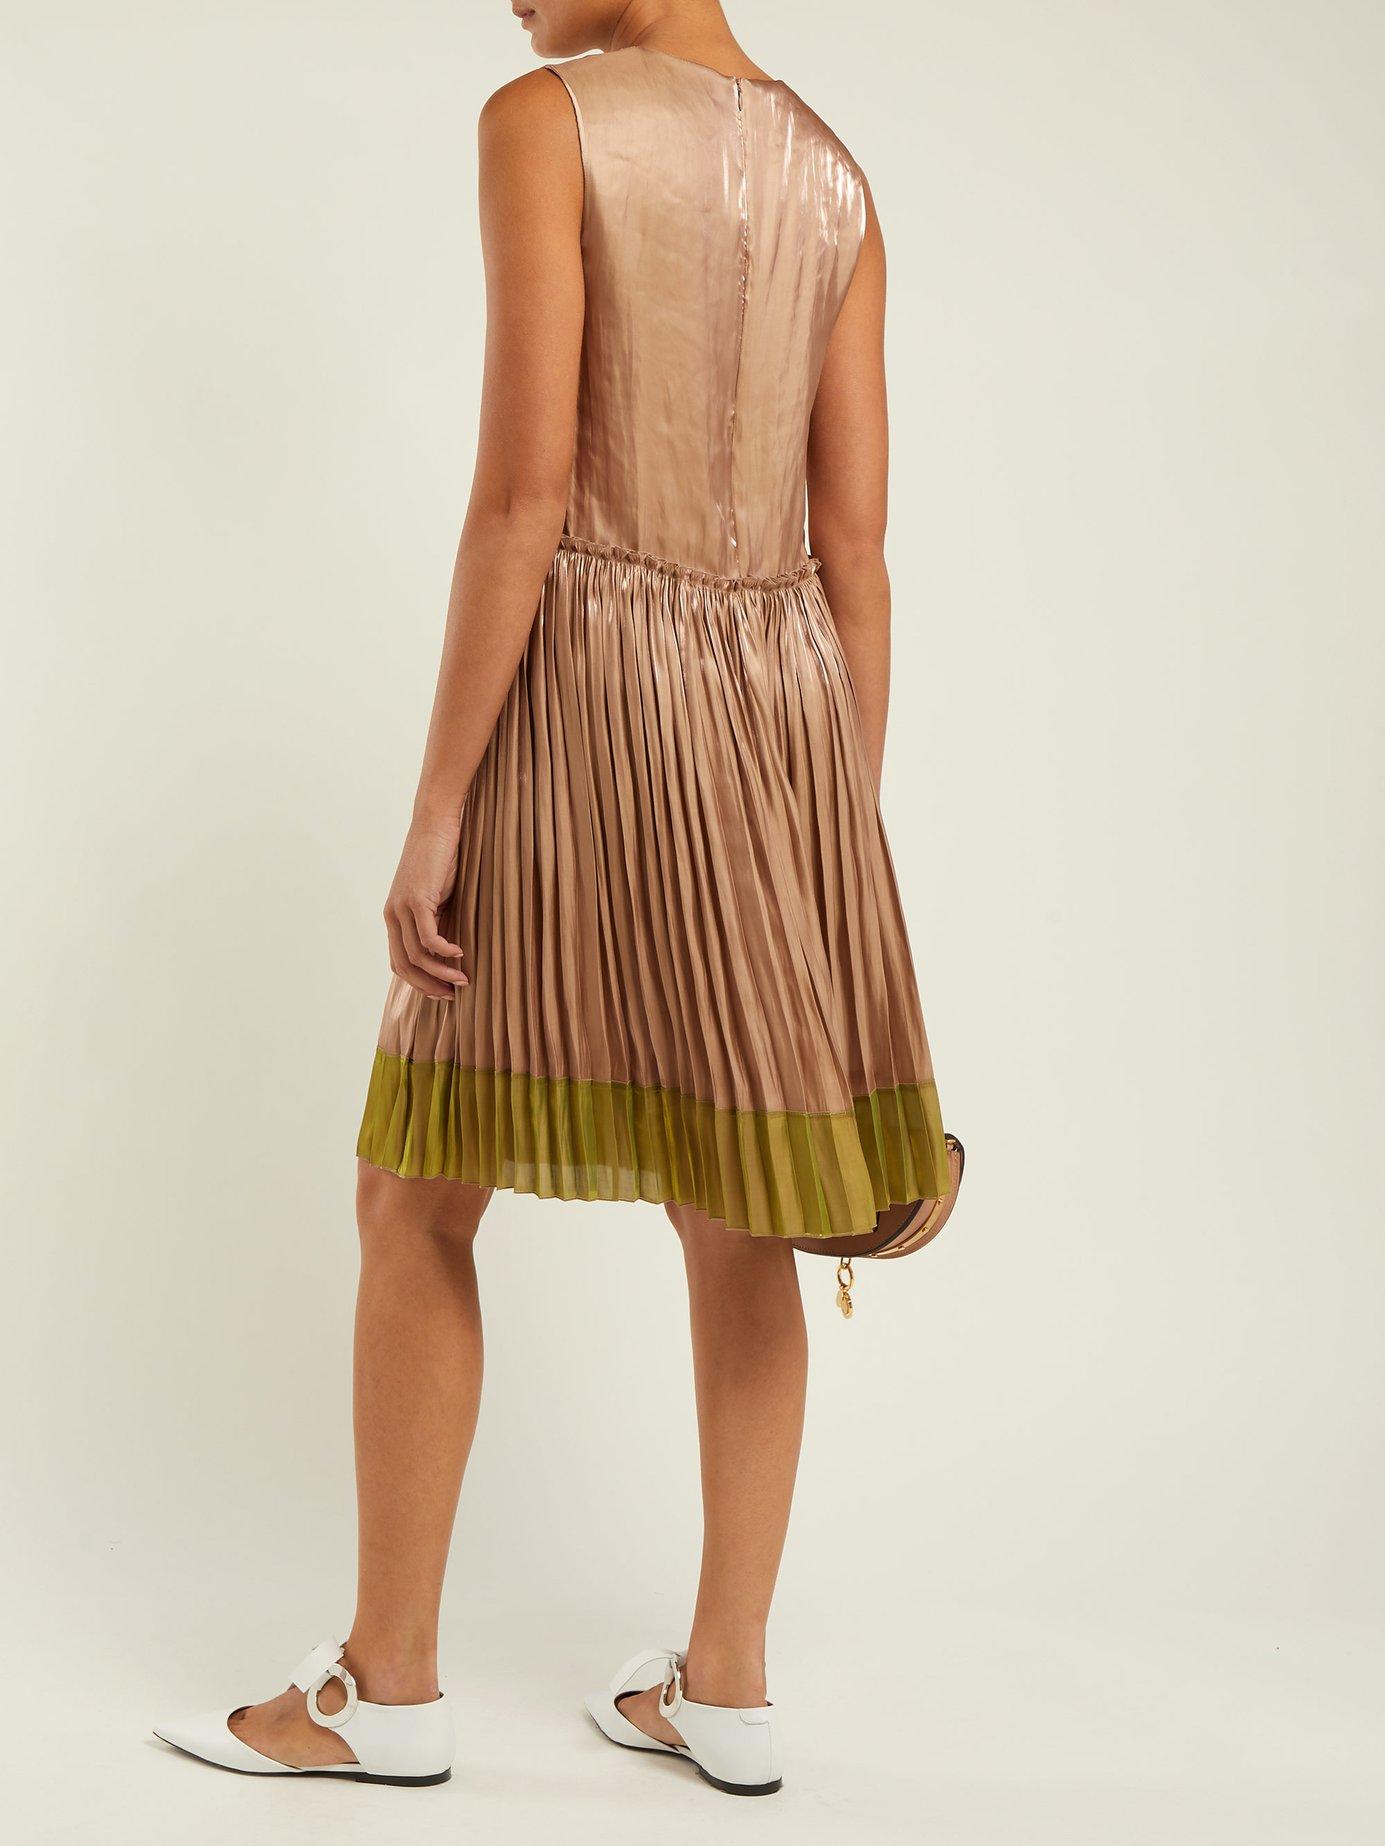 Metallic pleated dress by Redvalentino